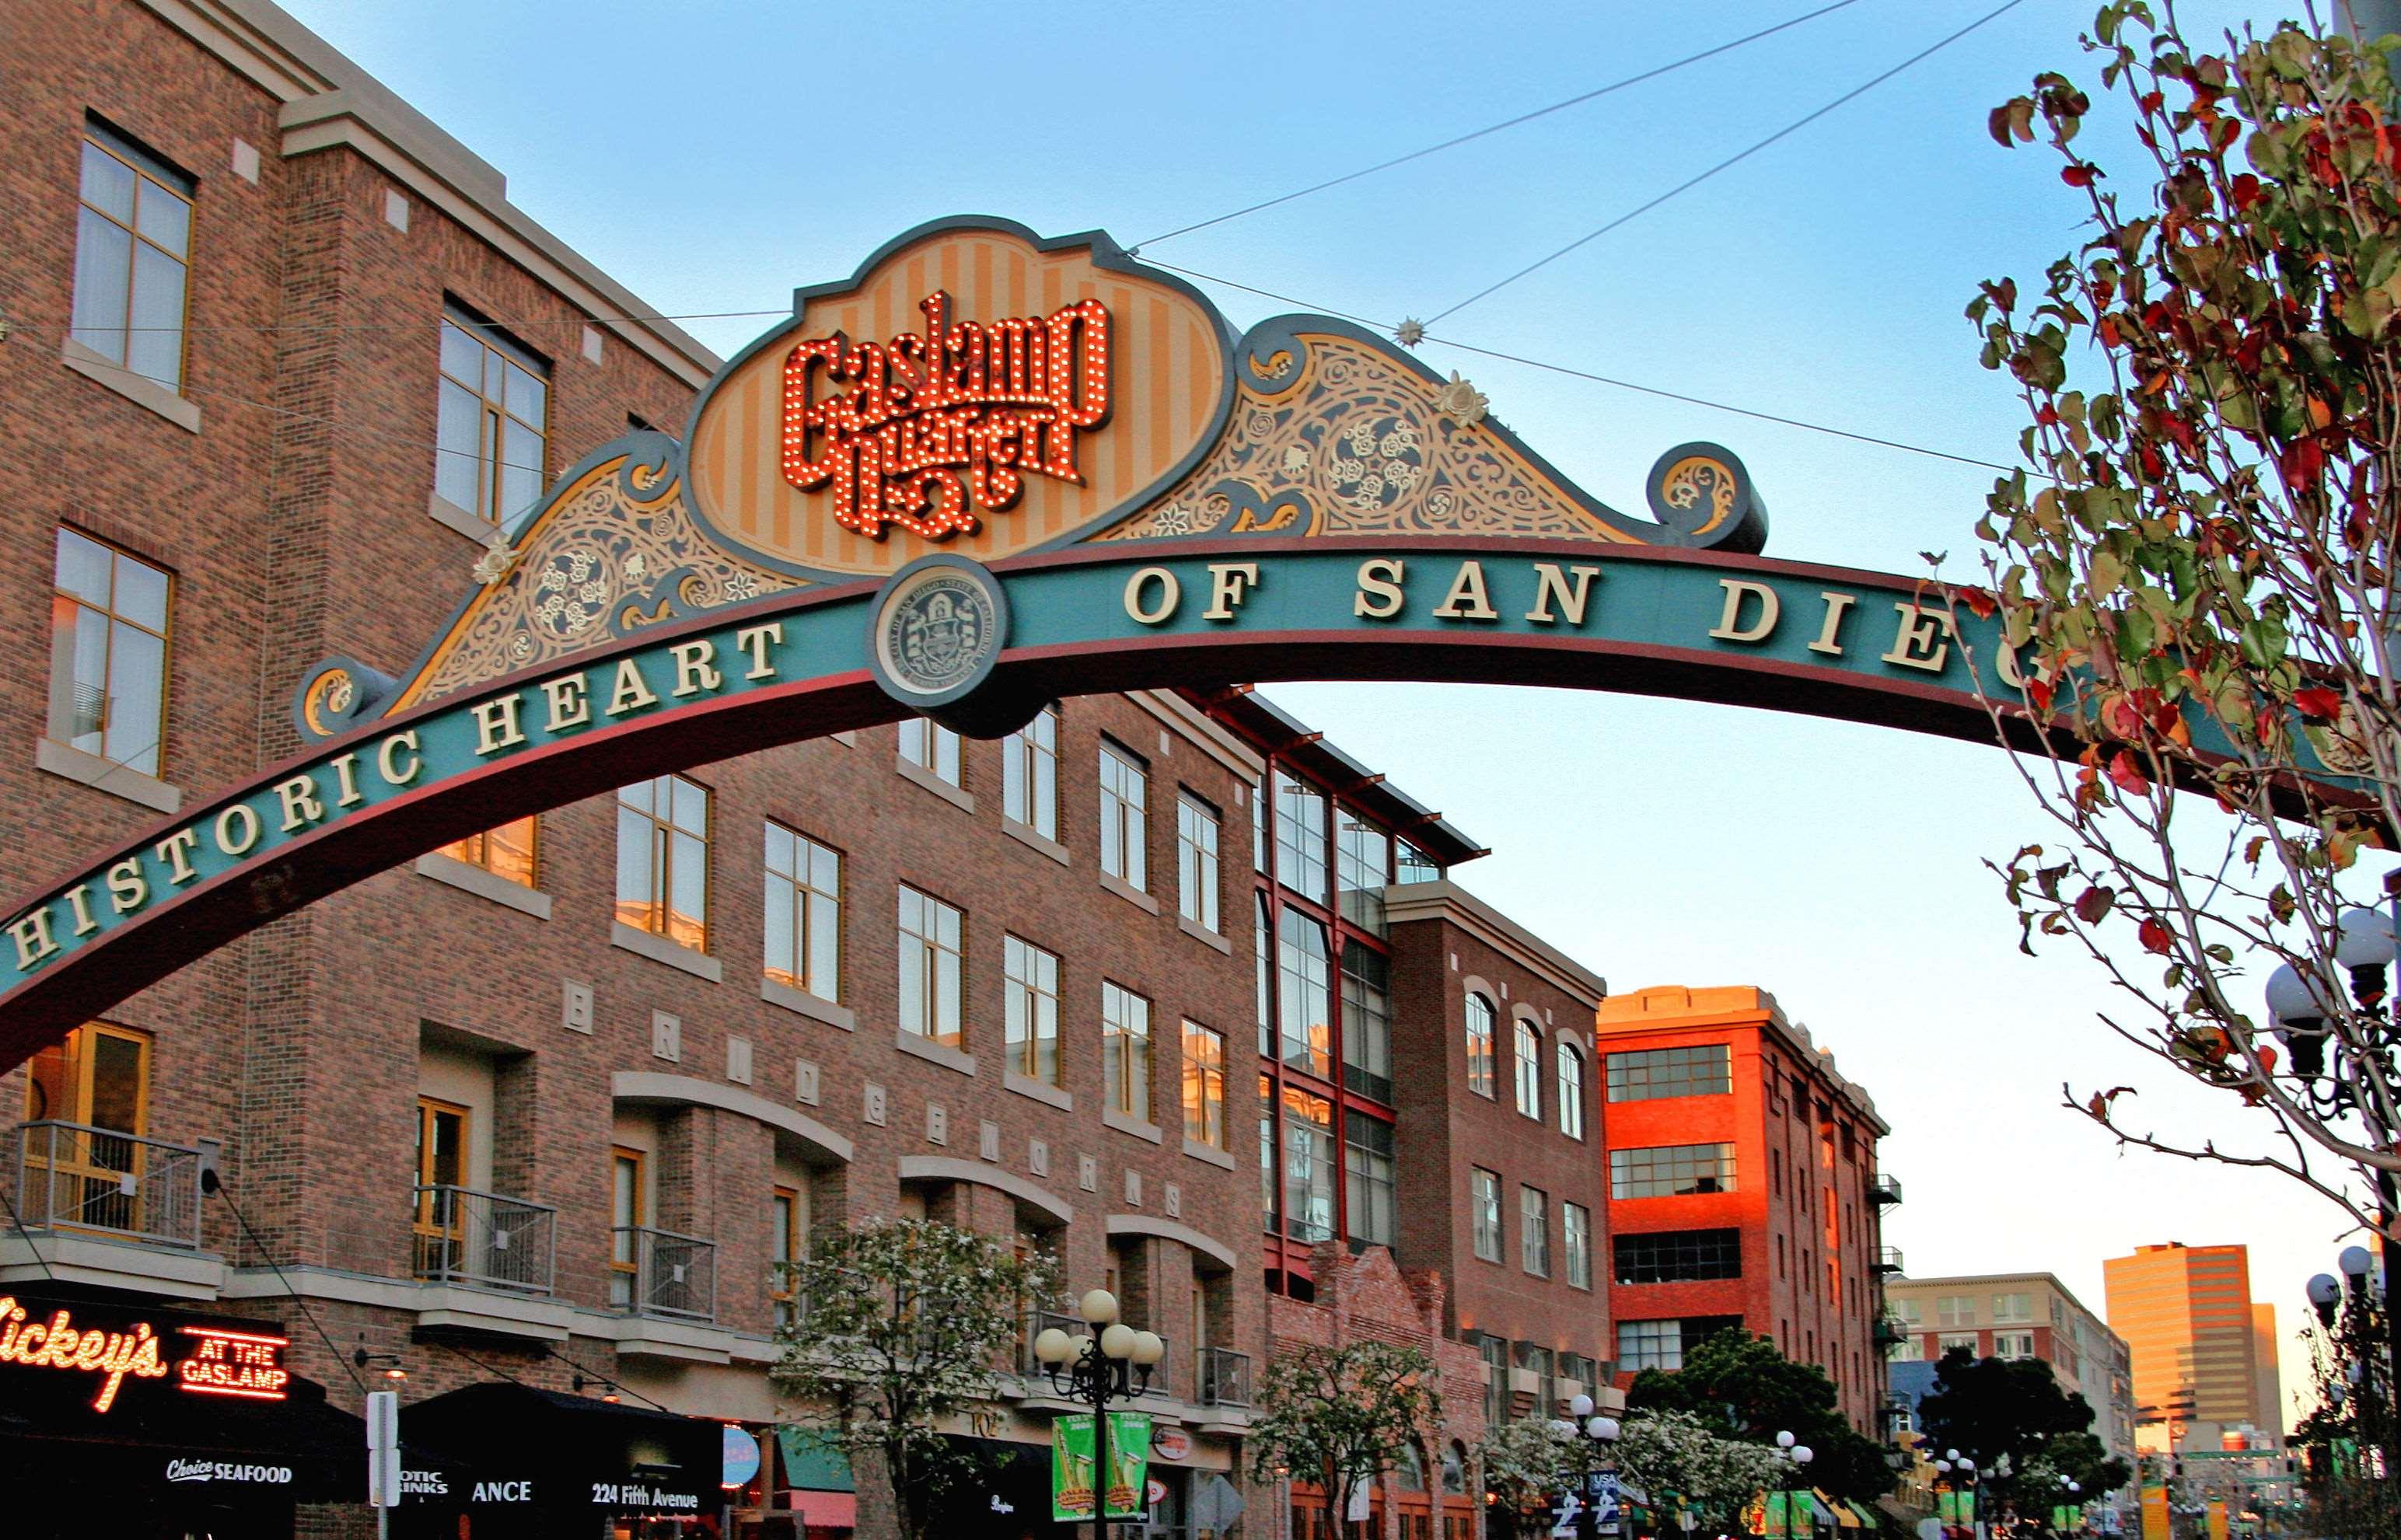 Best Italian Restaurant San Diego Downtown